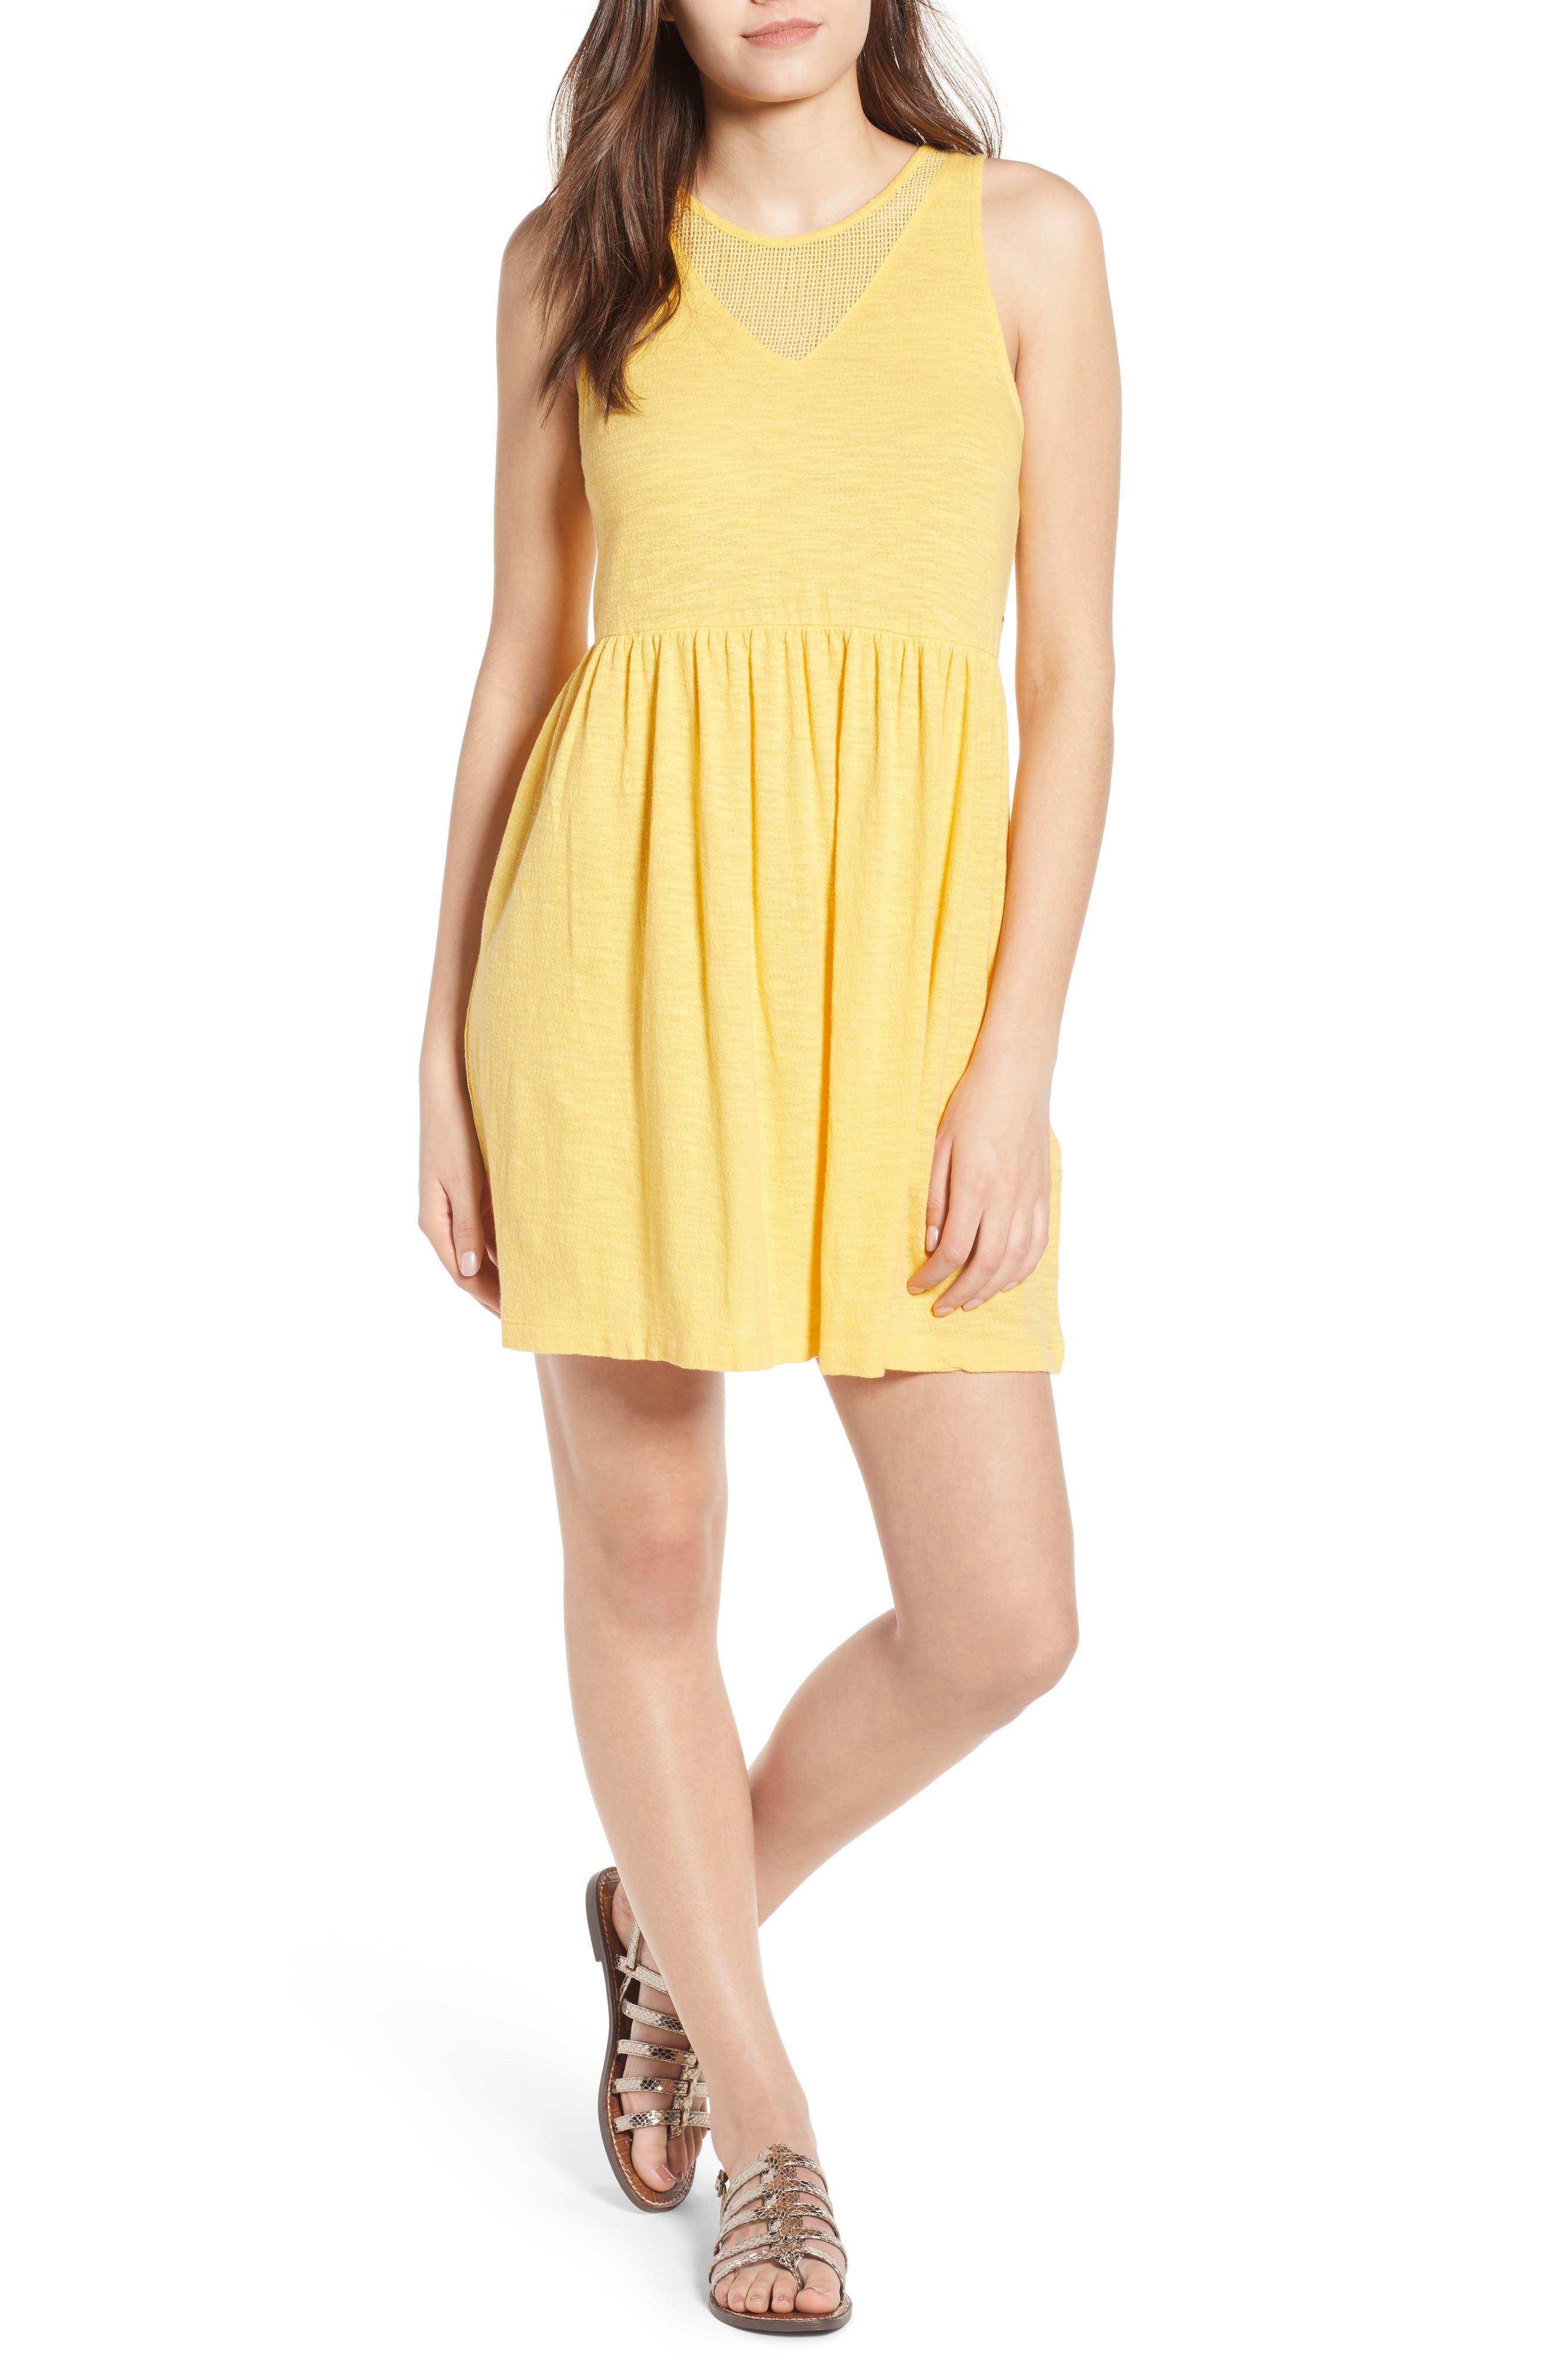 Tucson Cotton Dress,                         Main,                         color, Buff Yellow